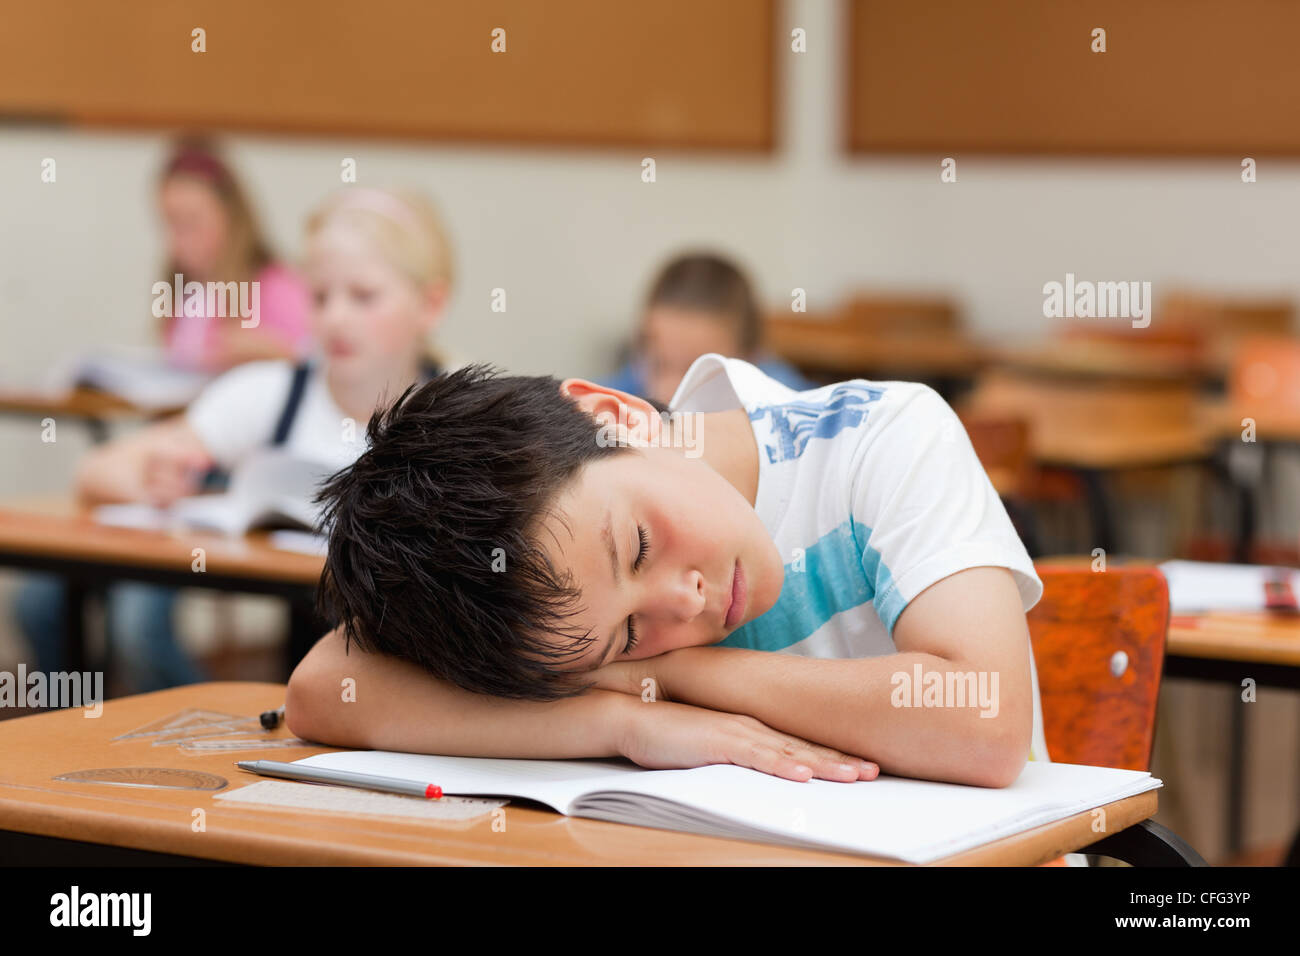 Schoolboy sleeping at desk - Stock Image